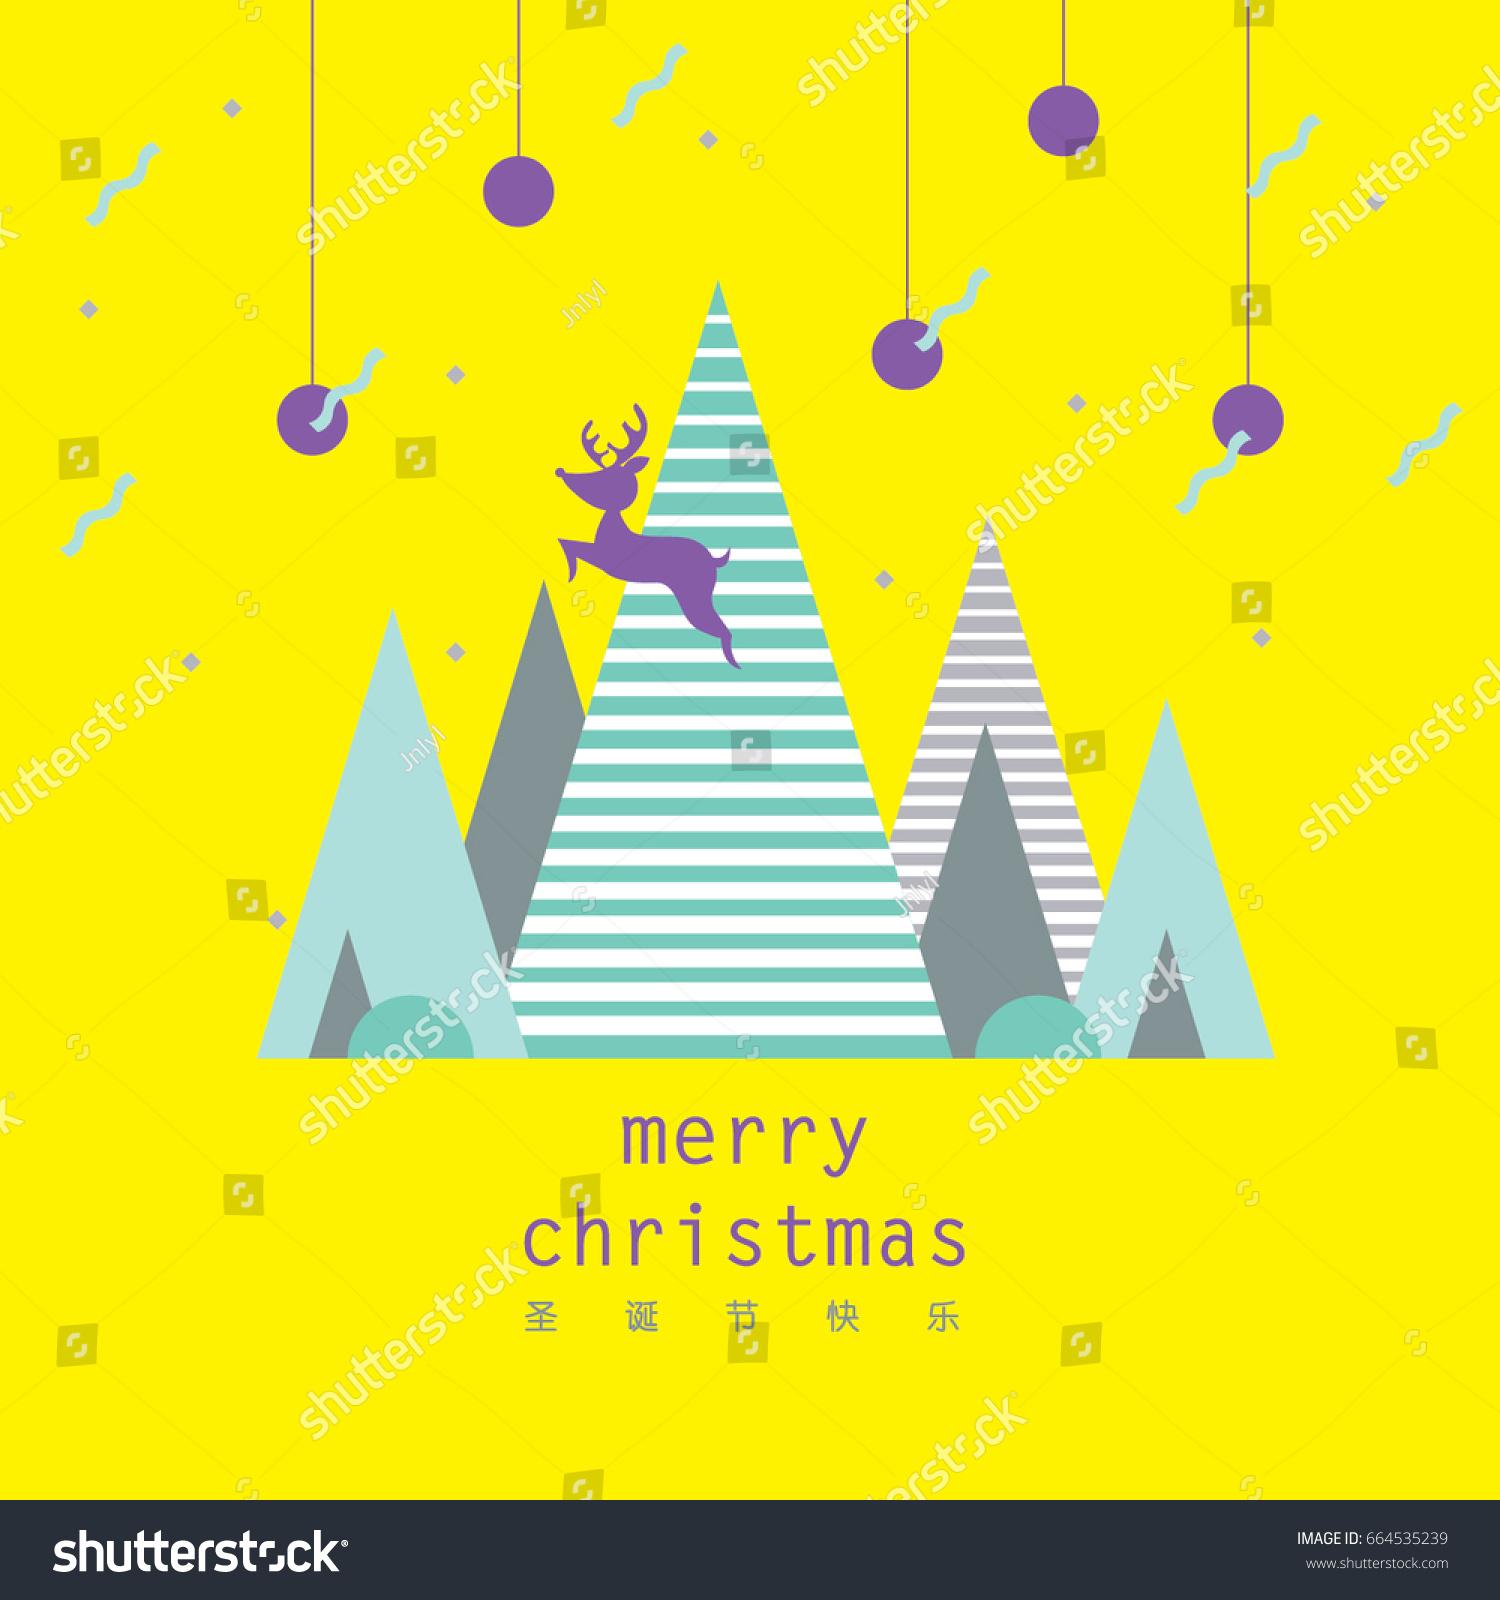 Merry Christmas Greetings Geometrical Background Design Stock ...